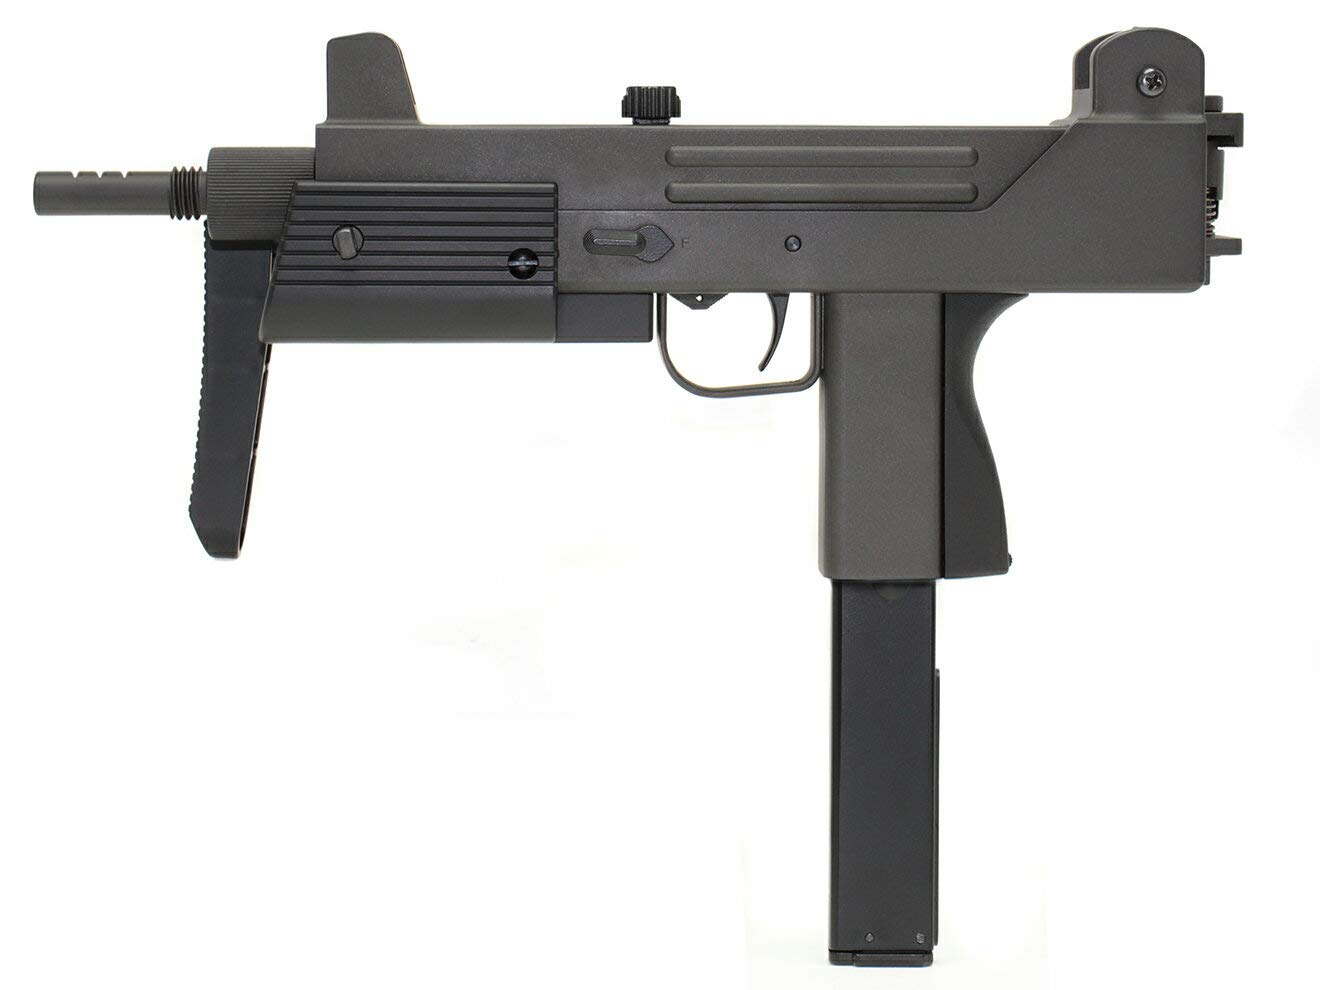 HFC GBB SWD M11/9 フルメタル 専用ケース付 本体セット B07K44YMPN